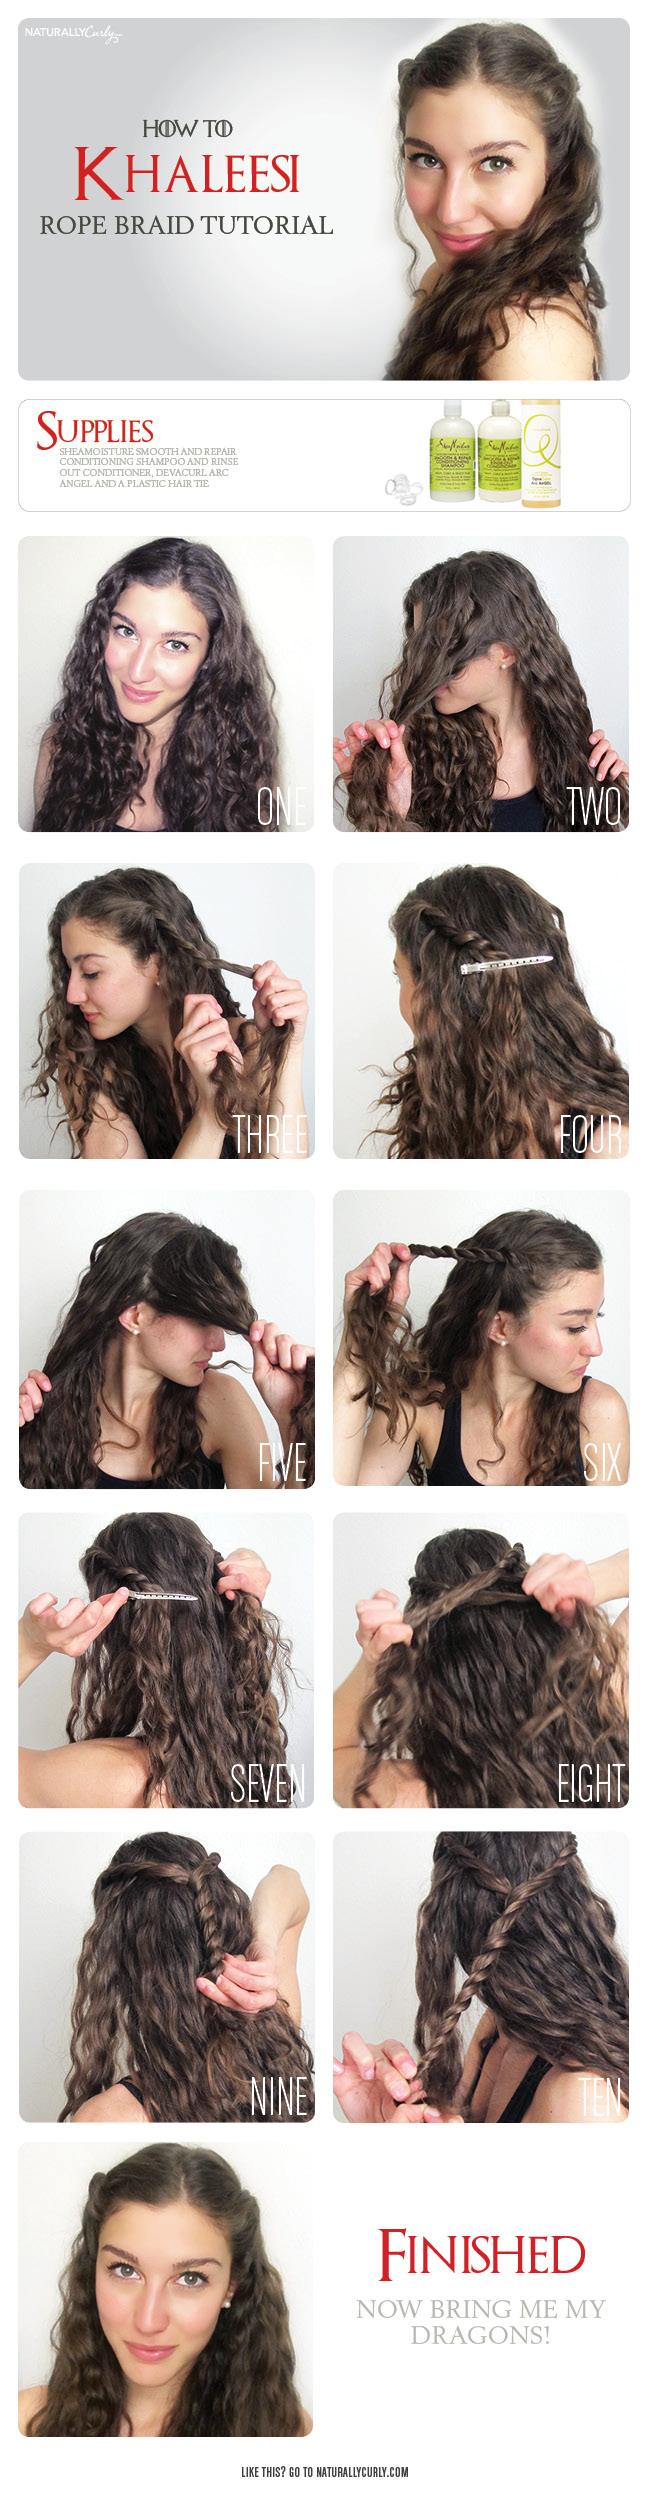 khaleesi rope braid